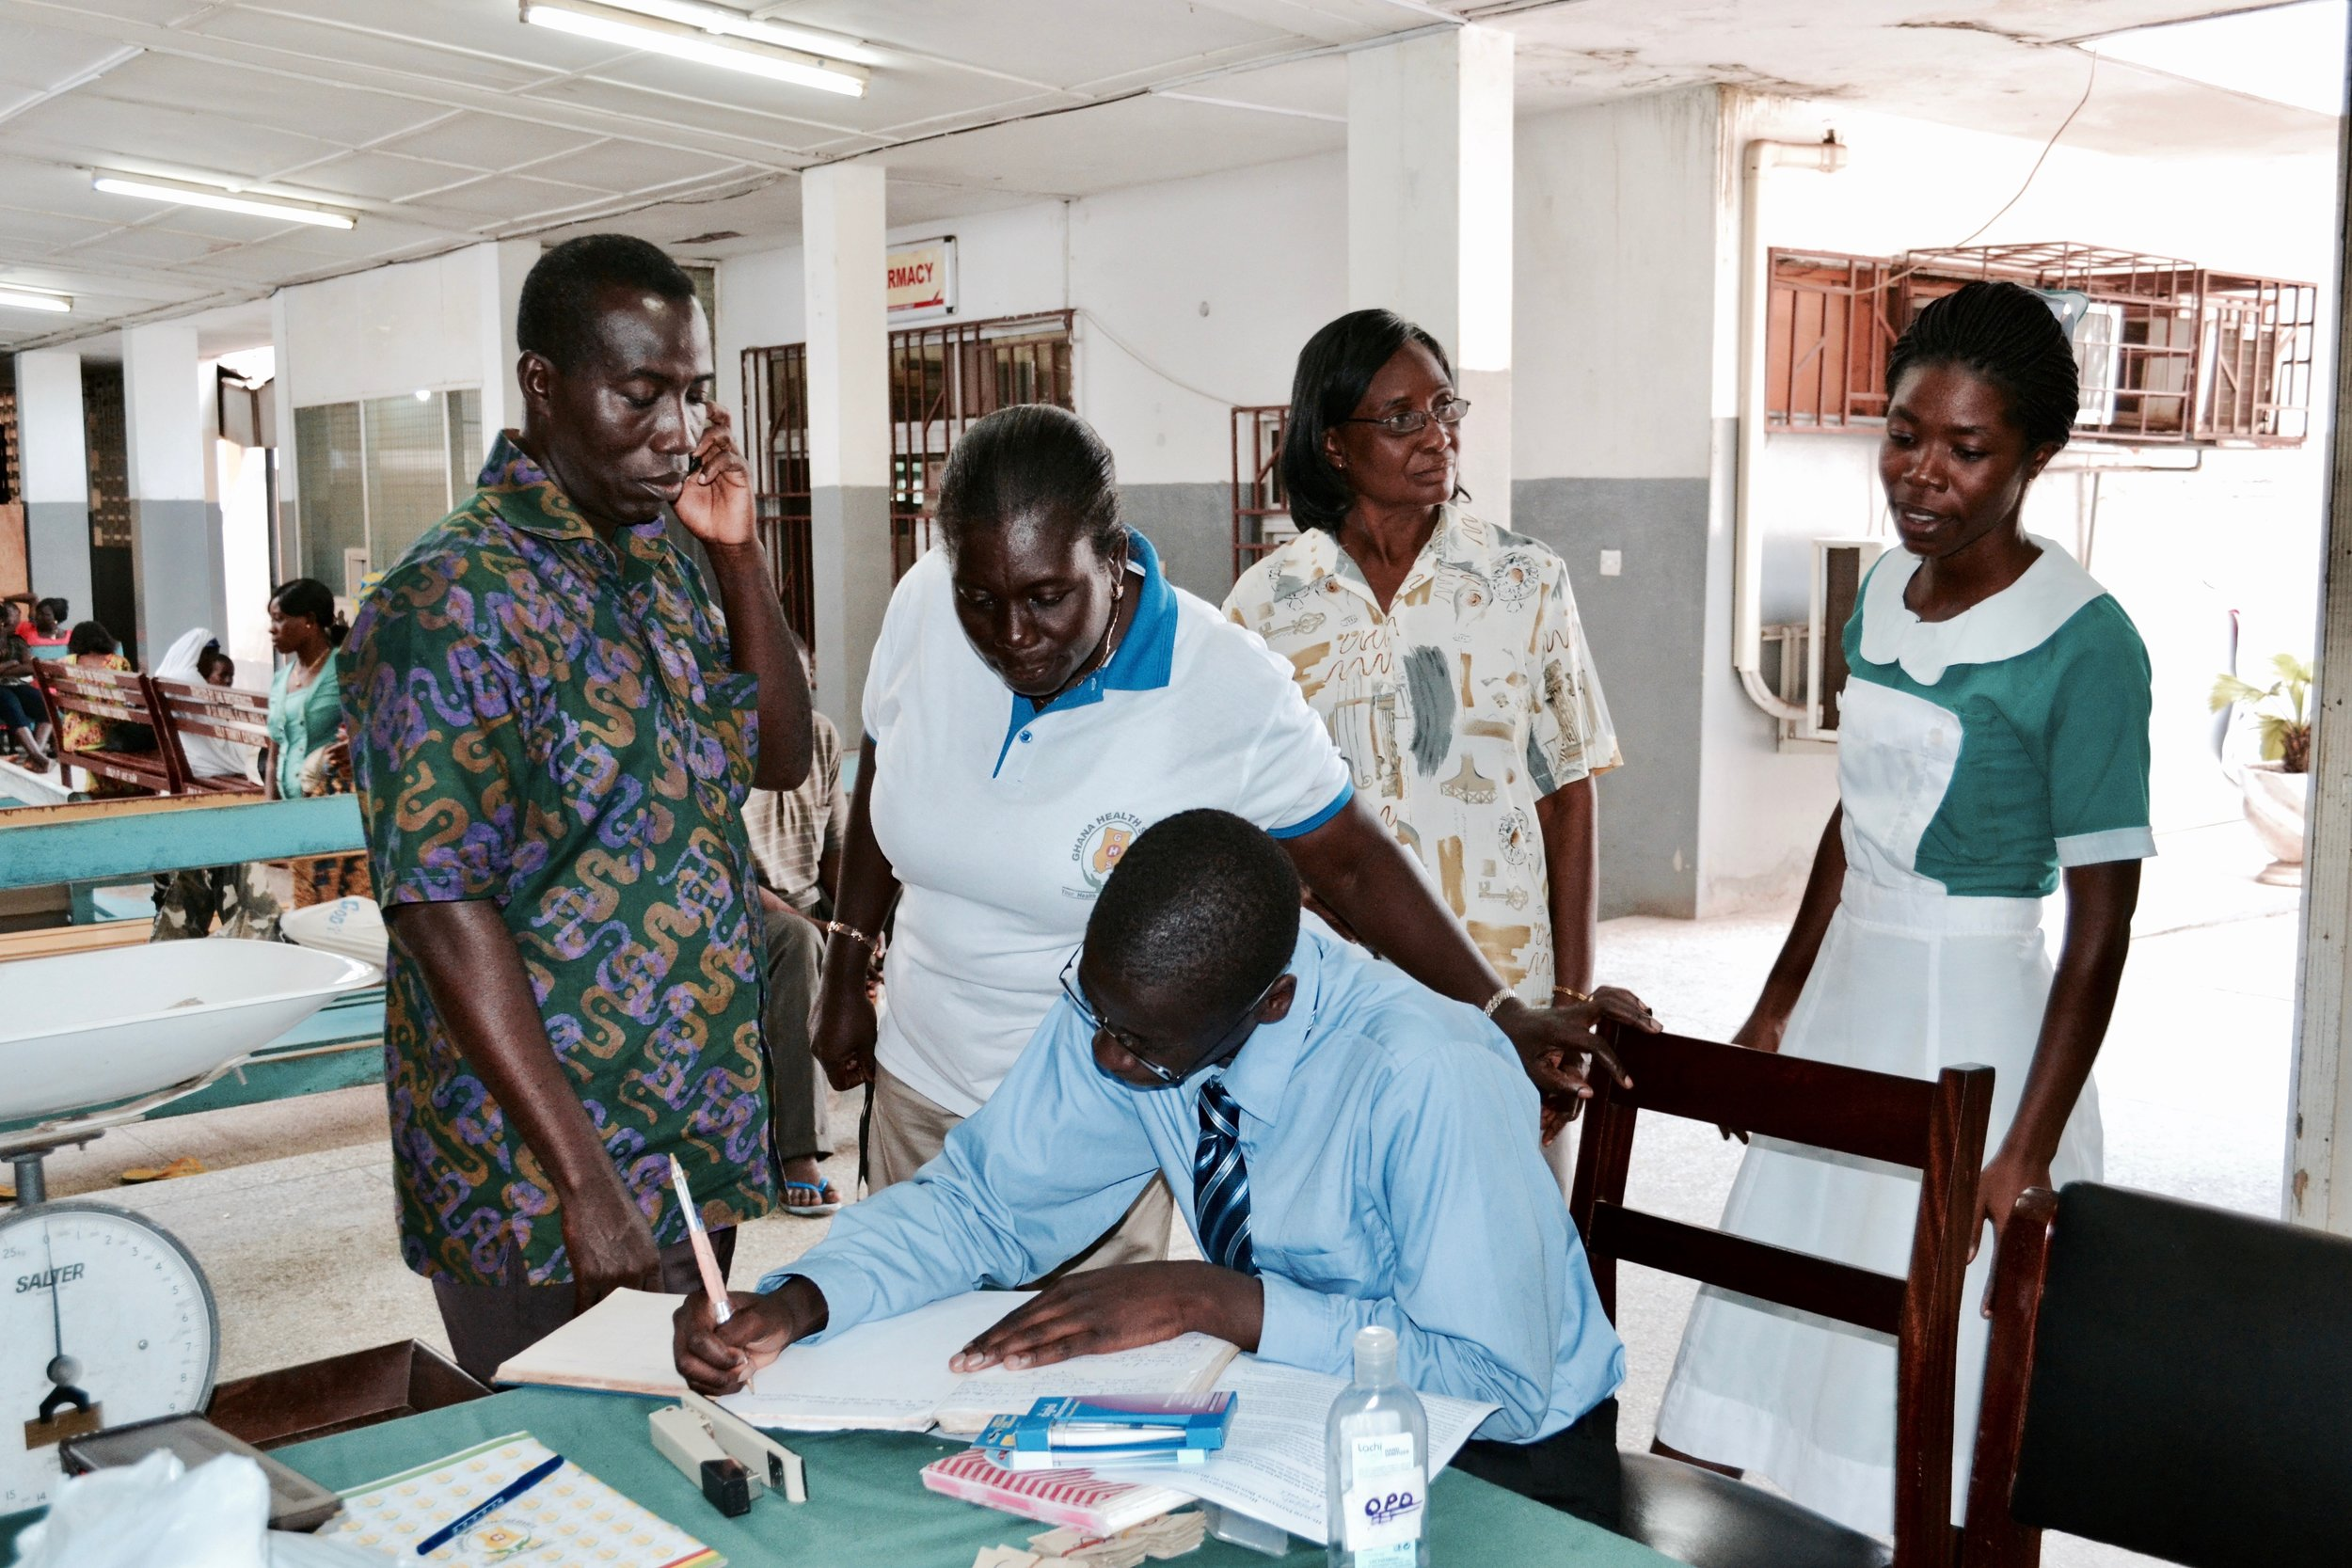 Joel Bervell signing the registry after donating medical supplies to Labadi Hospital